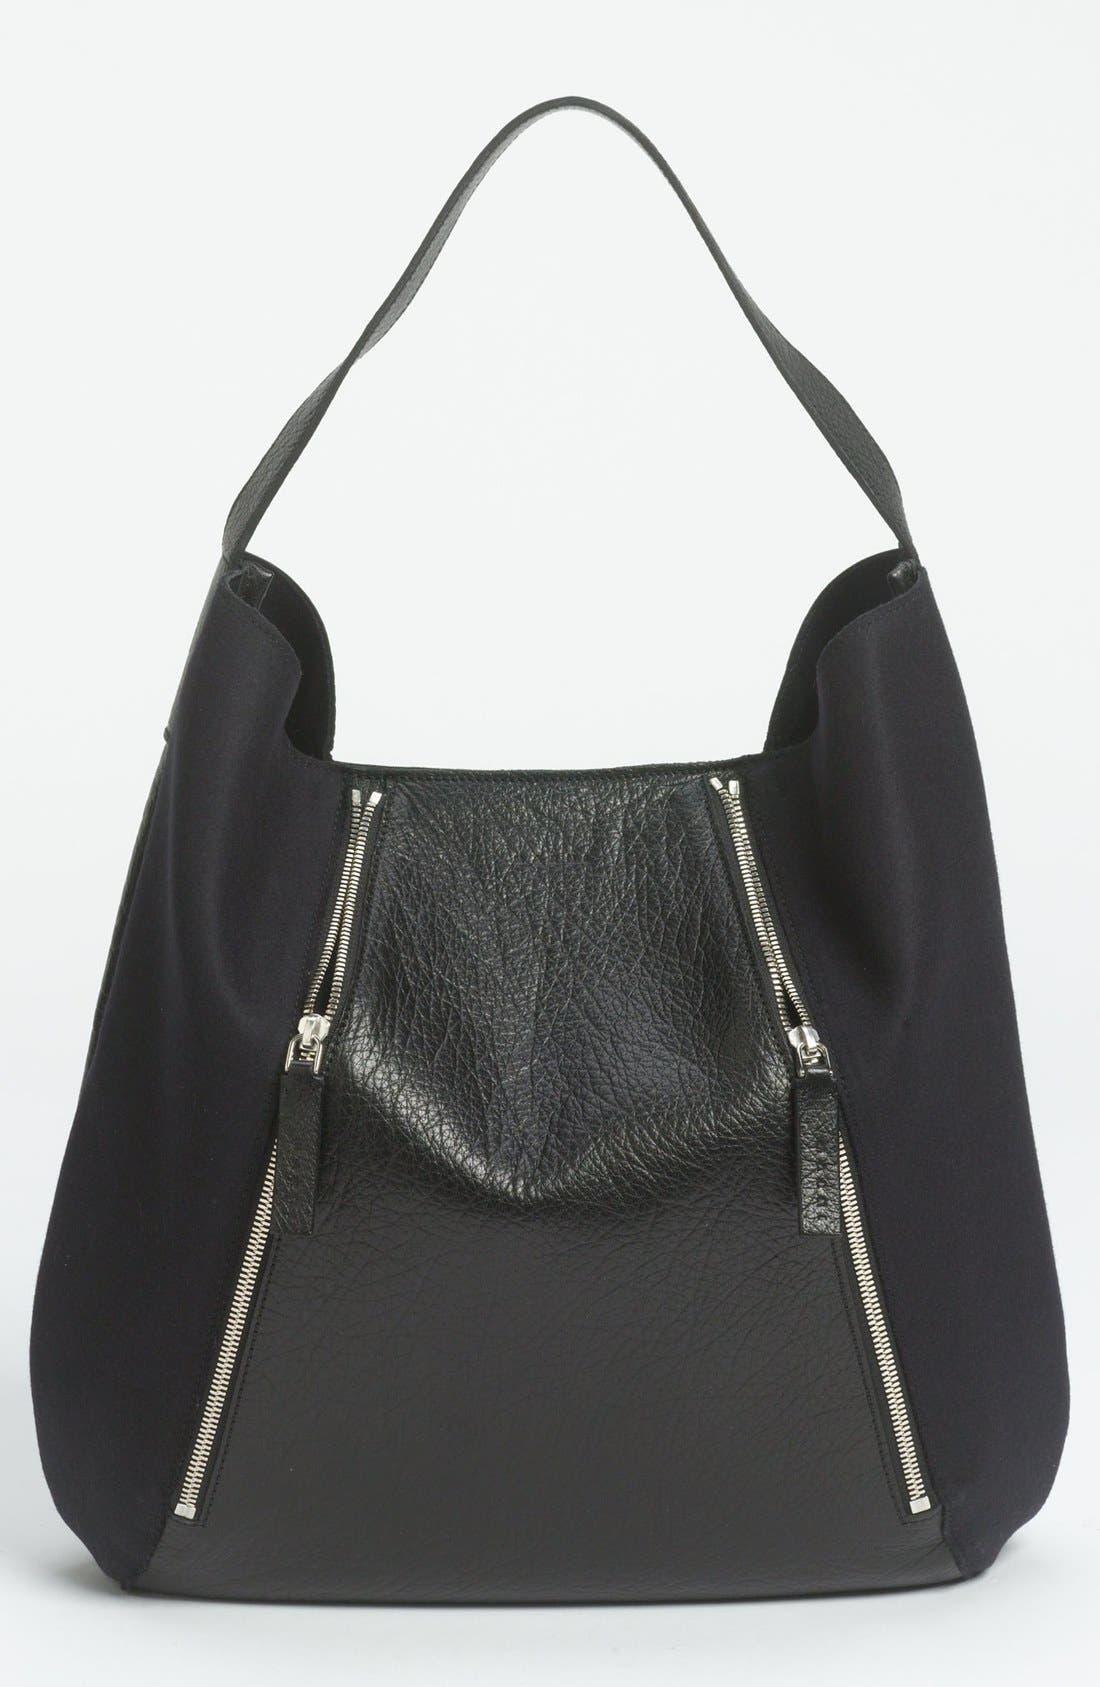 Alternate Image 1 Selected - Marni Bicolor Leather & Fabric Hobo